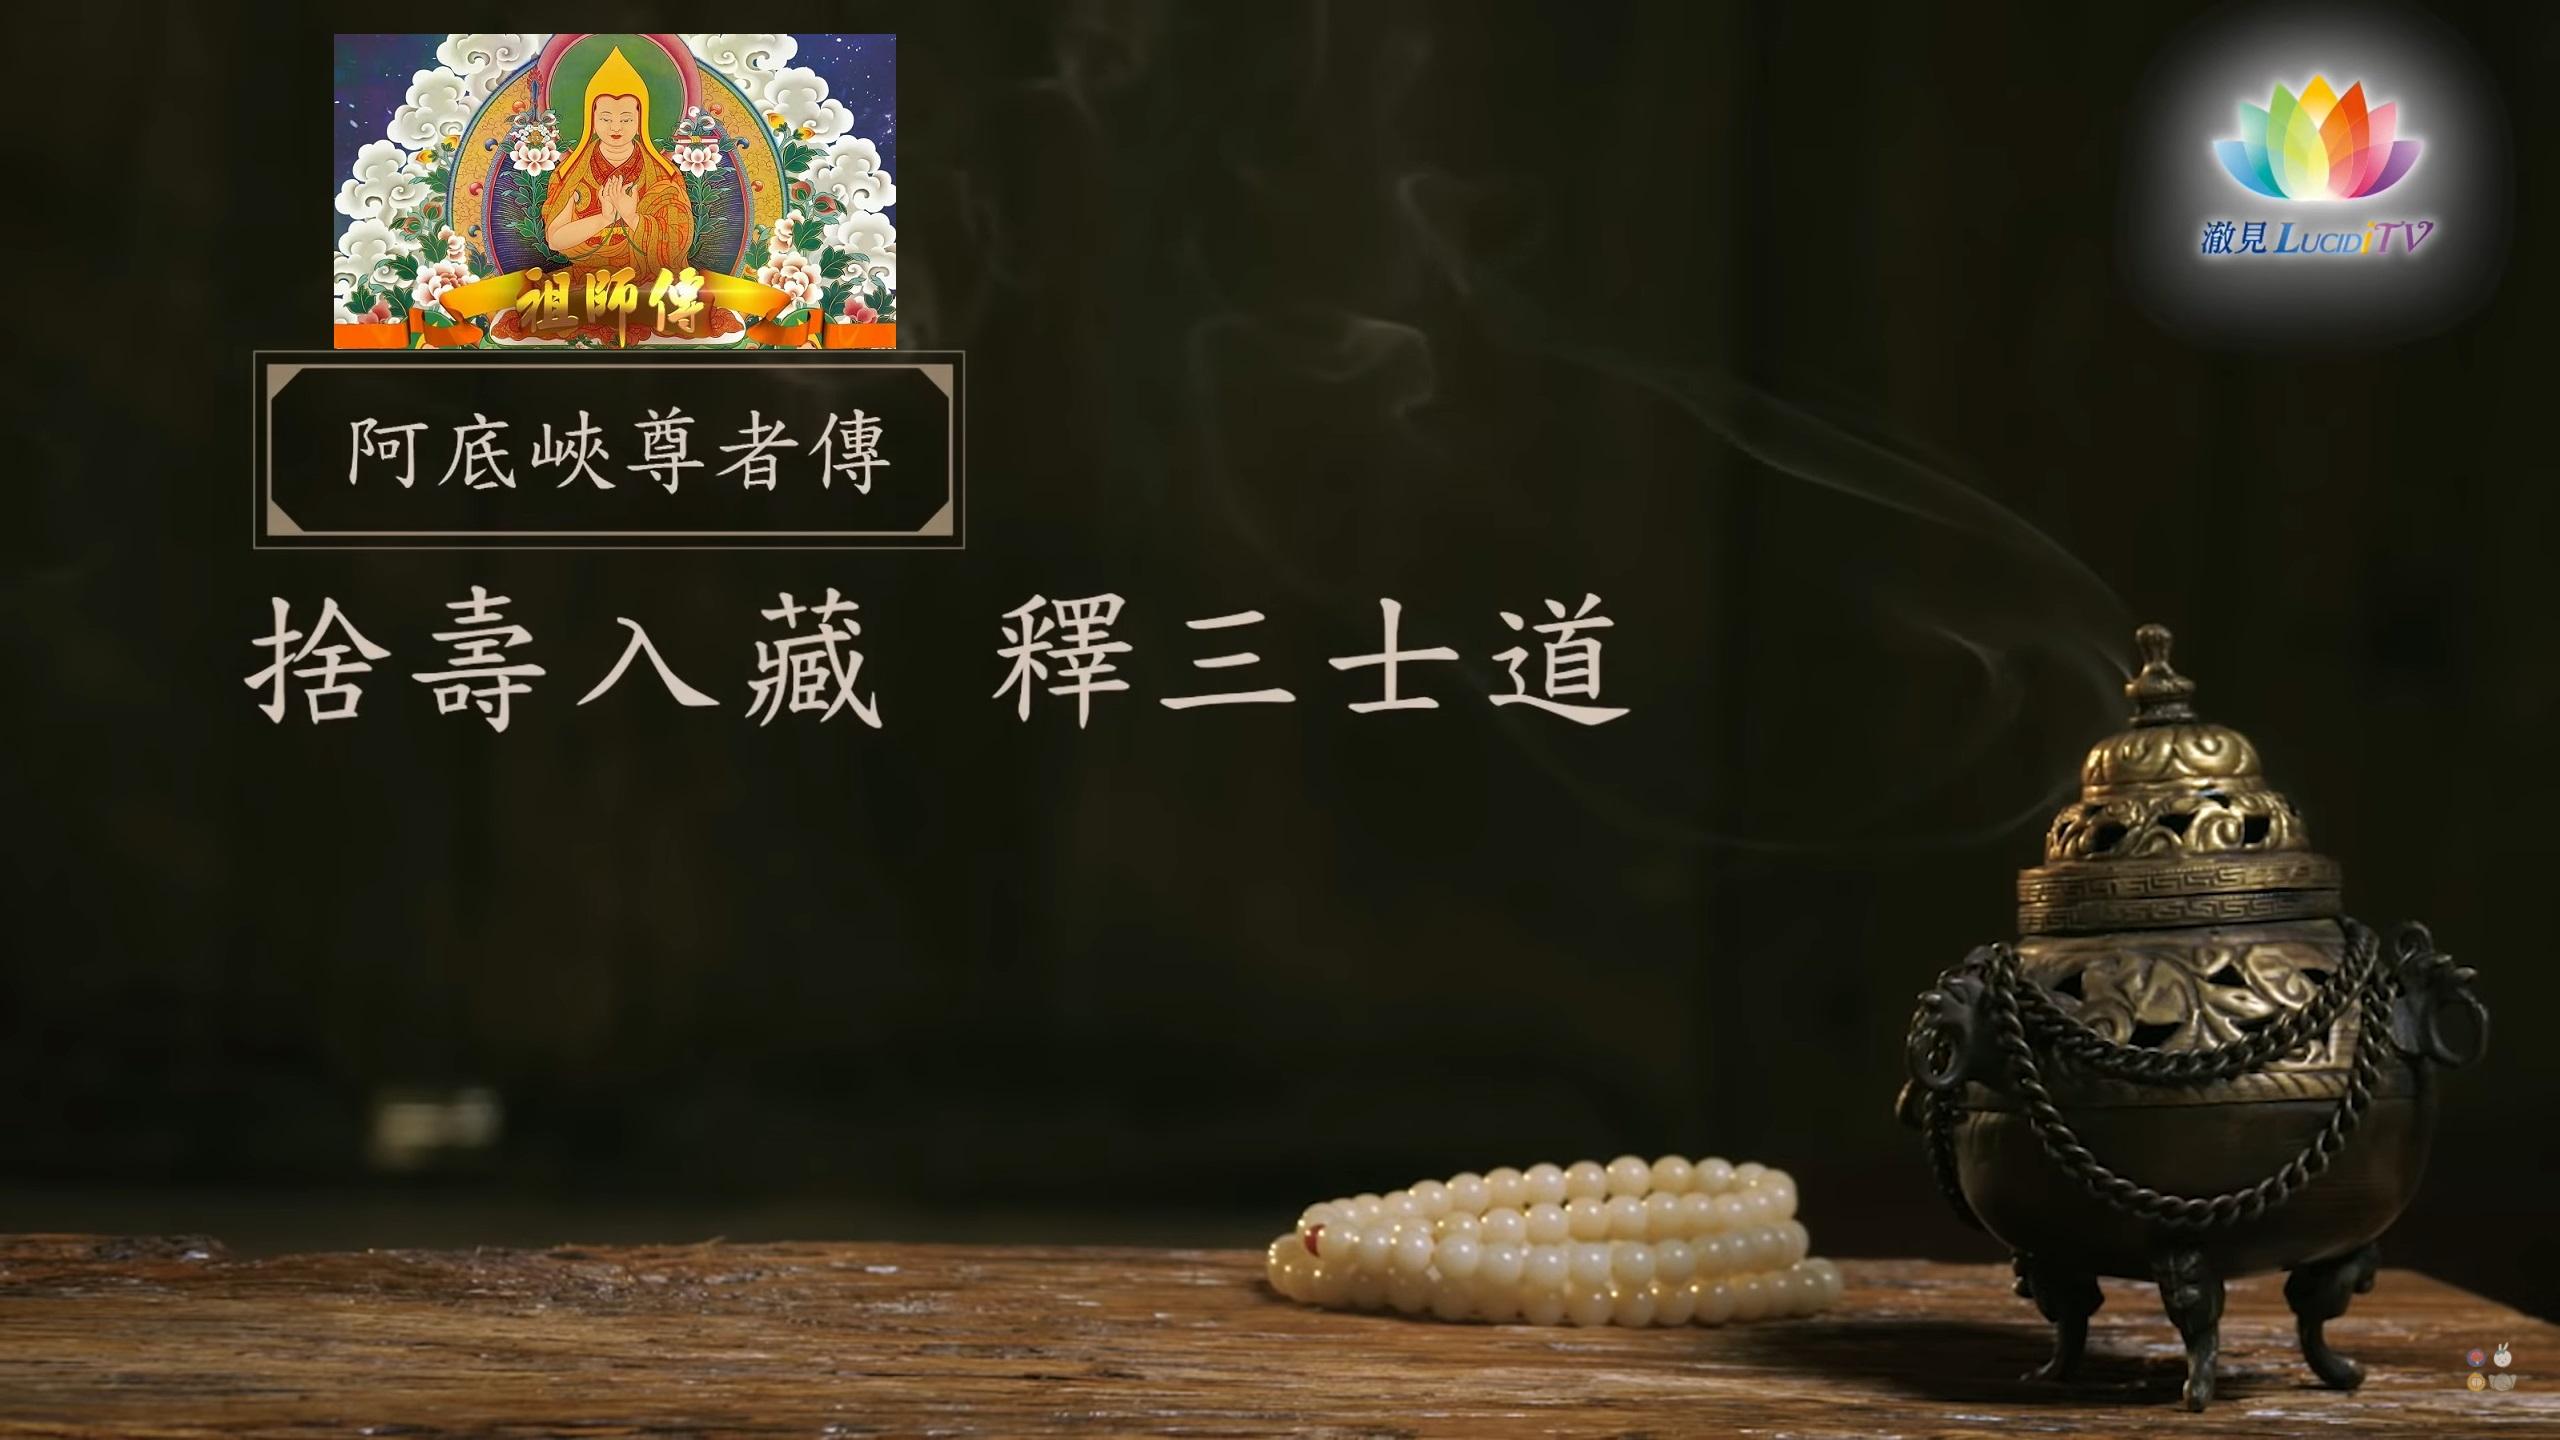 THE LEGACY OF MASTER ATISHA 【 阿底峽尊者傳 】#18   捨壽入藏・釋三士道・祖師傳 27.9.2020